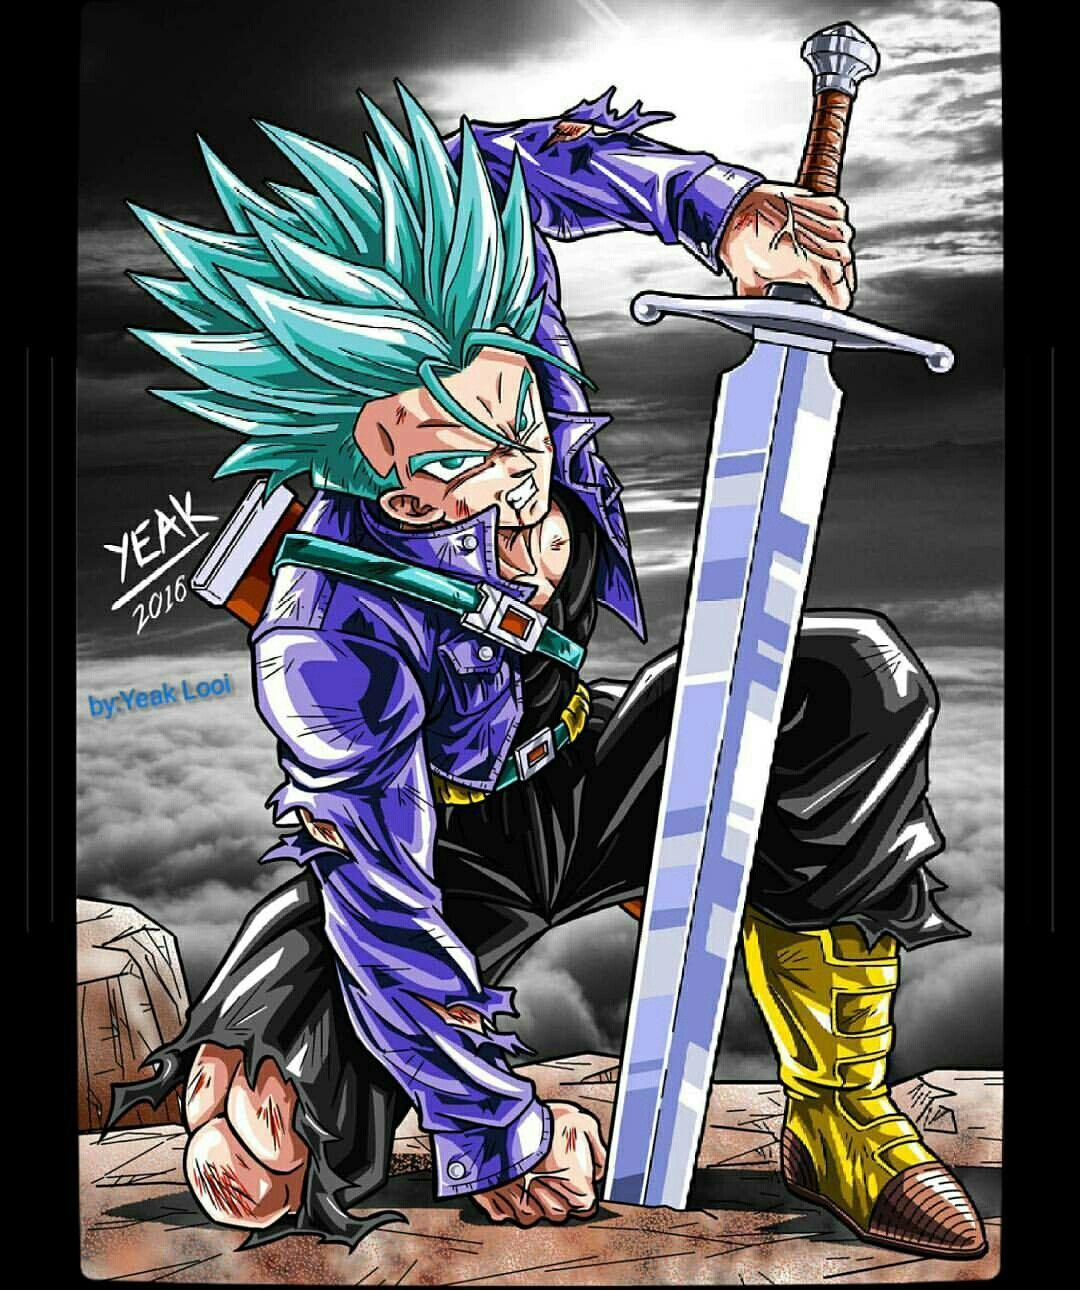 Future Trunks Ssgss Anime Dragon Ball Super Dragon Ball Super Manga Dragon Ball